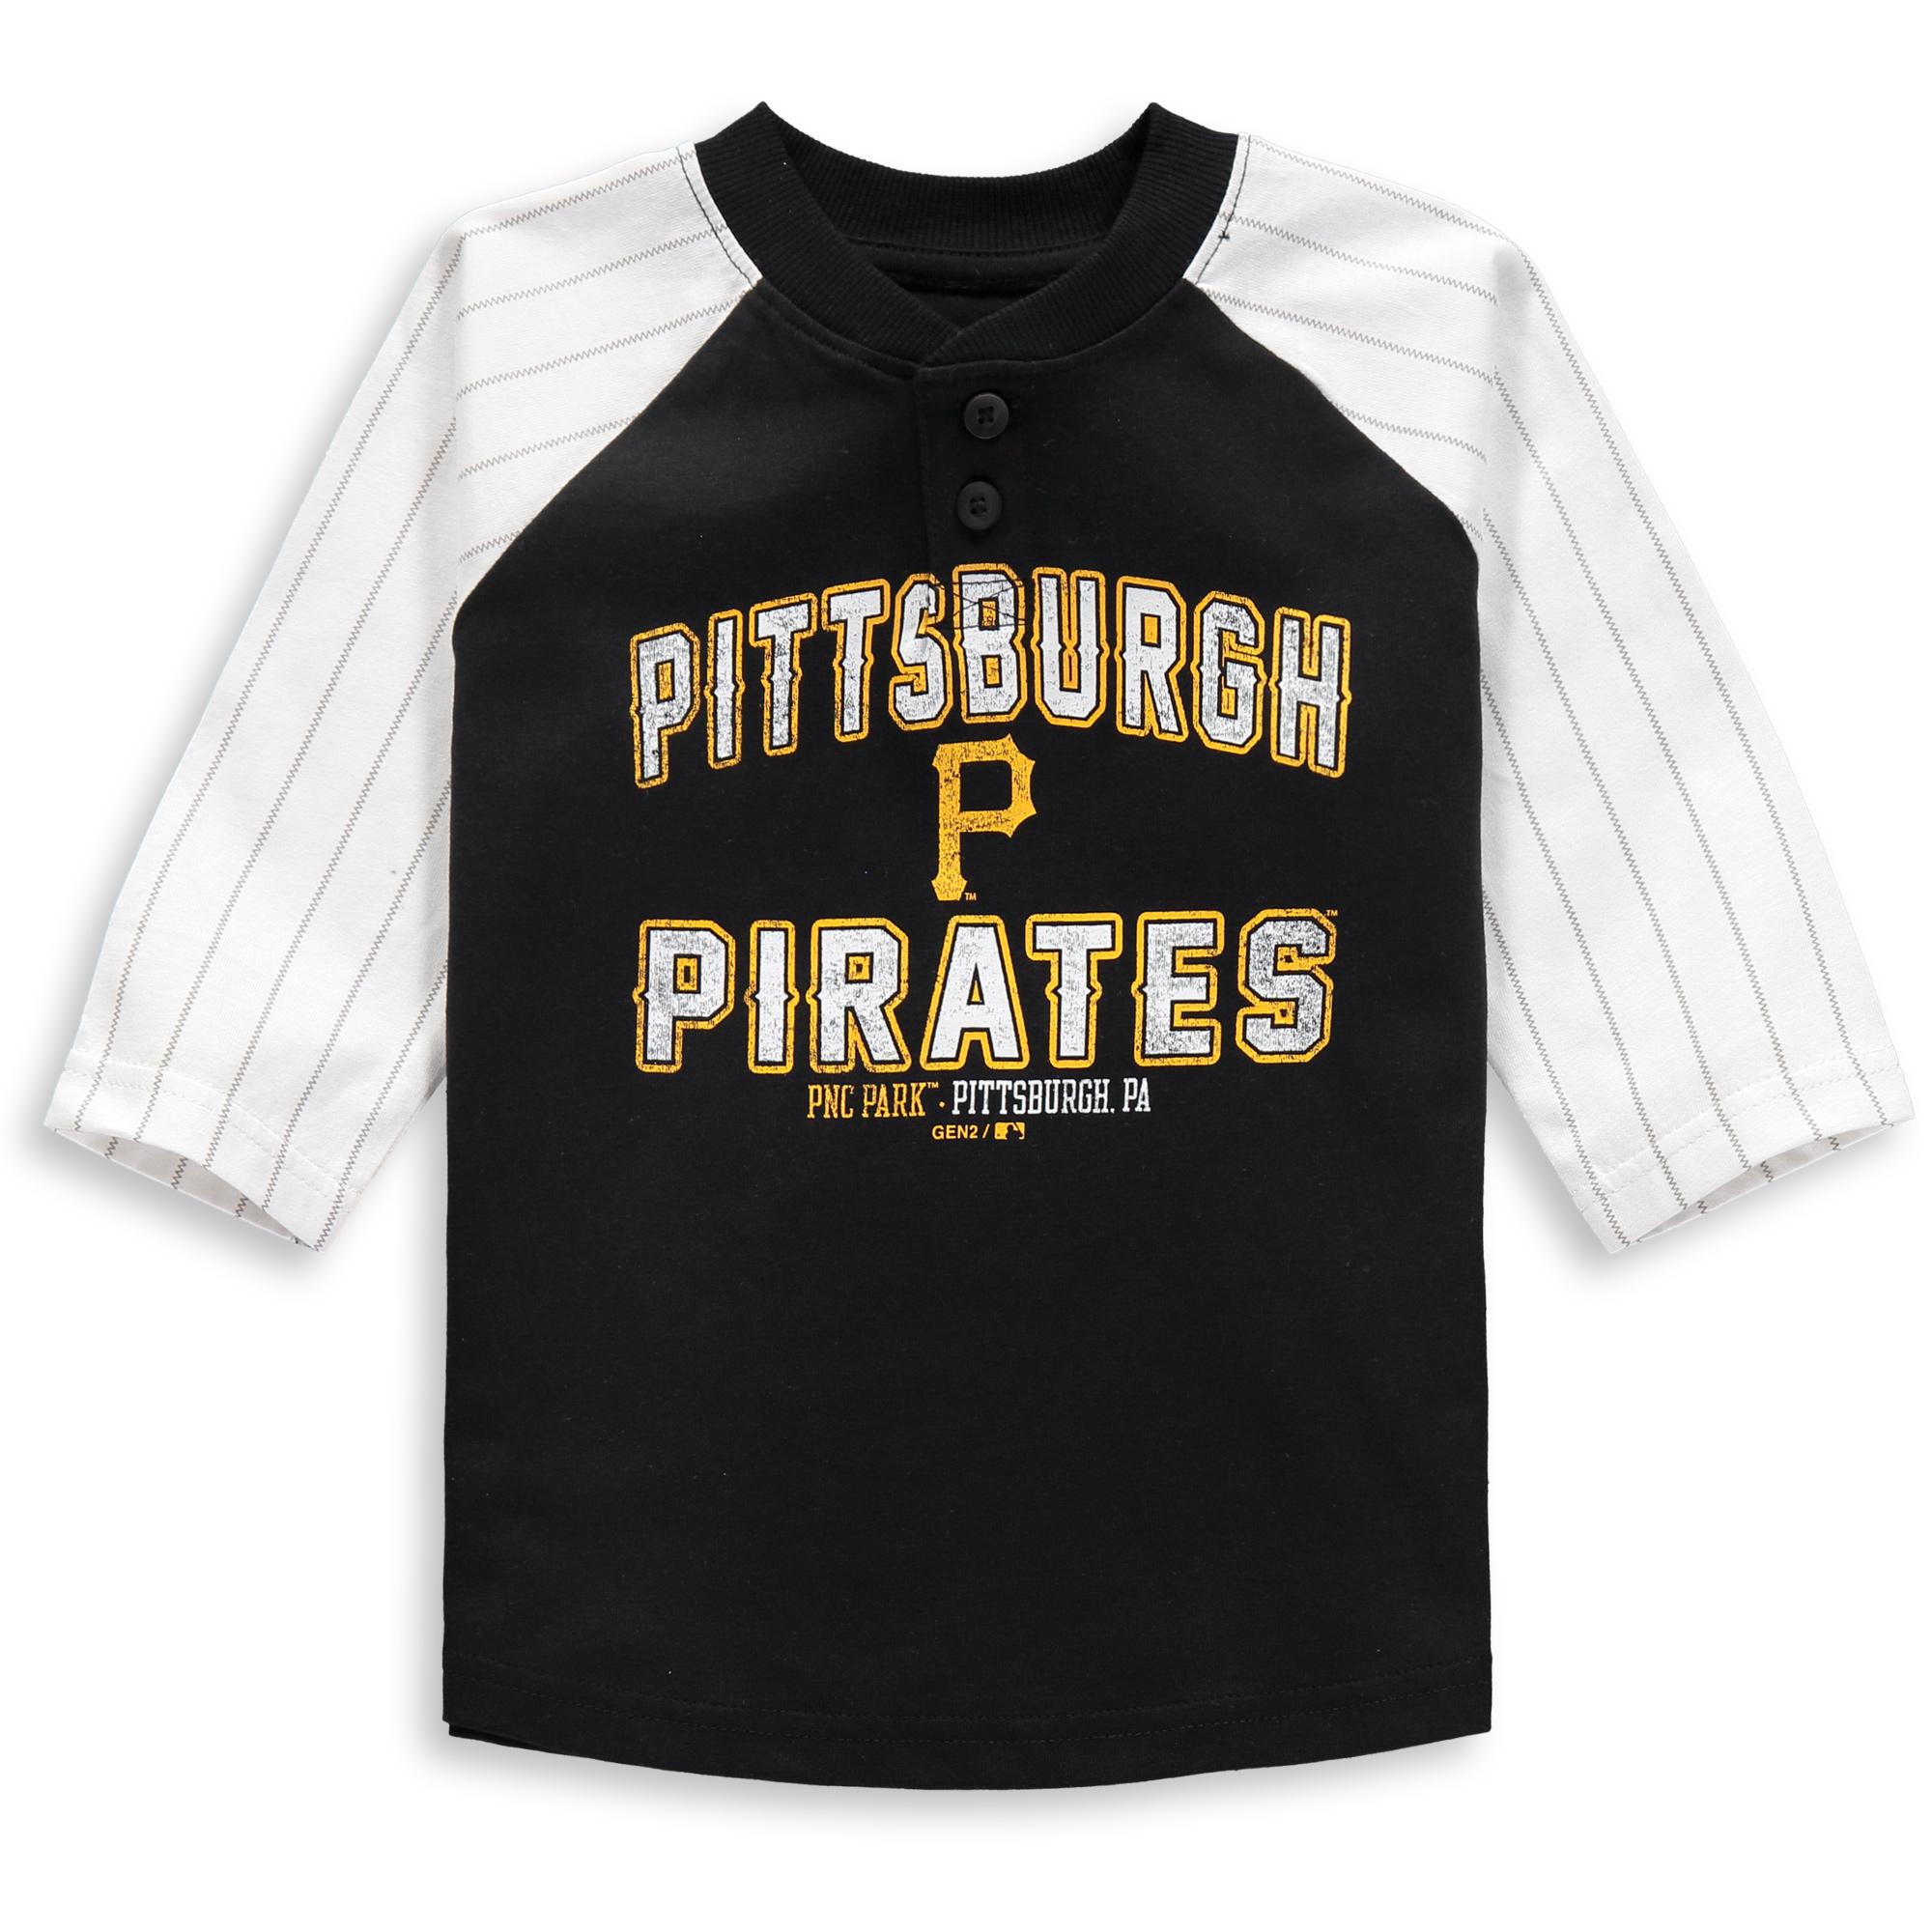 Pittsburgh Pirates Toddler The Original 3/4-Sleeve T-Shirt - Black